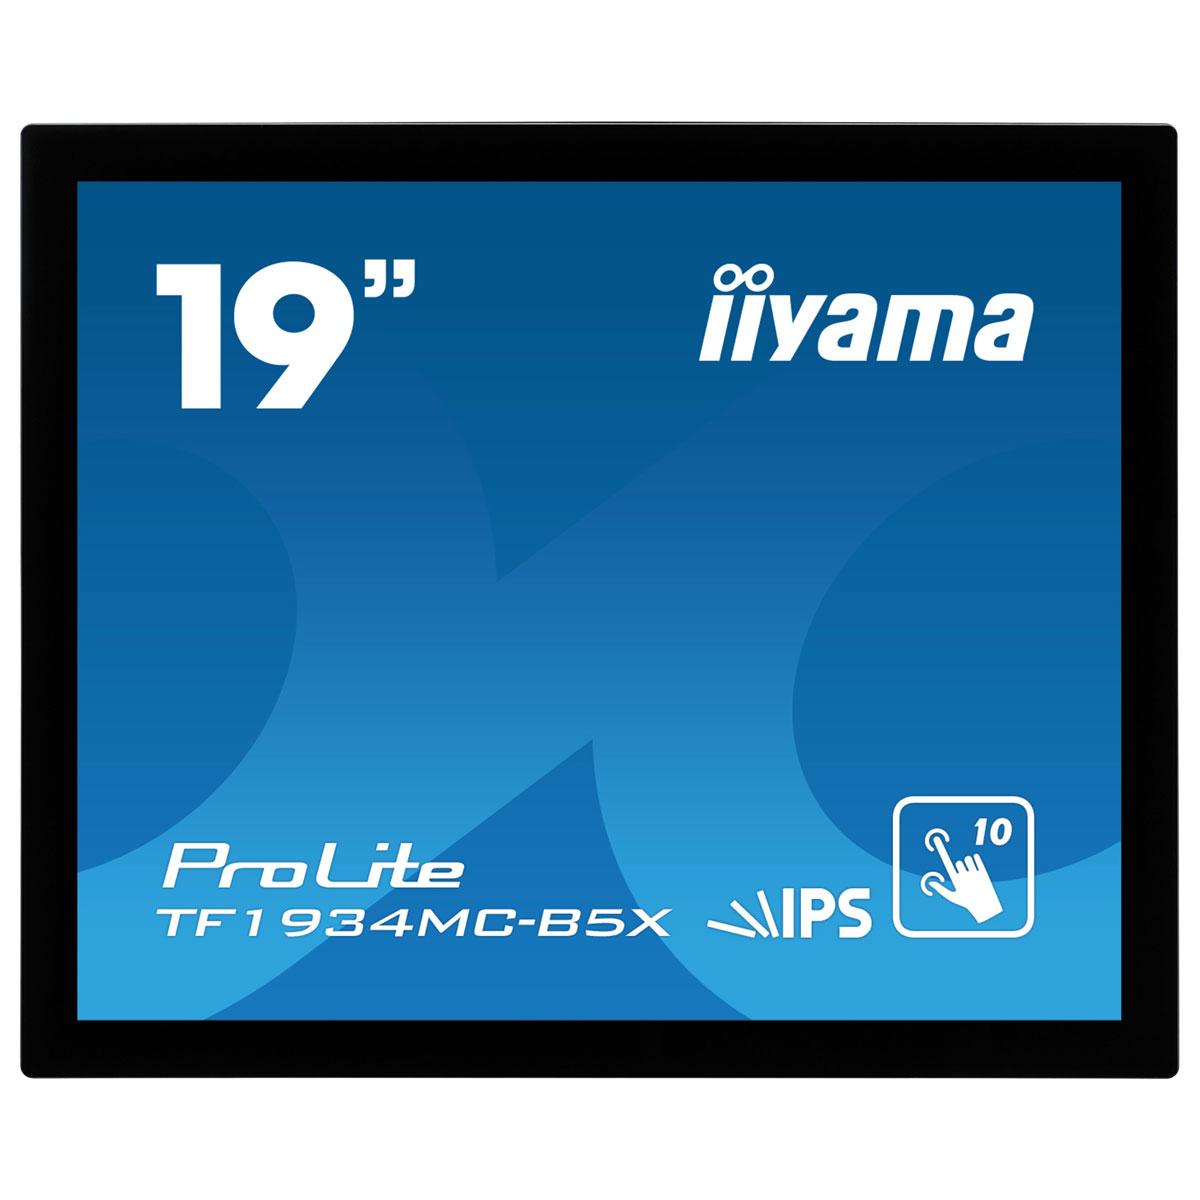 "Ecran PC iiyama 19"" LED Tactile - ProLite TF1934MC-B5X 1280 x 1024 pixels - Tactile MultiTouch - 14 ms - Format 5/4 - Dalle IPS - HDMI - DisplayPort - Noir - Sans pied"